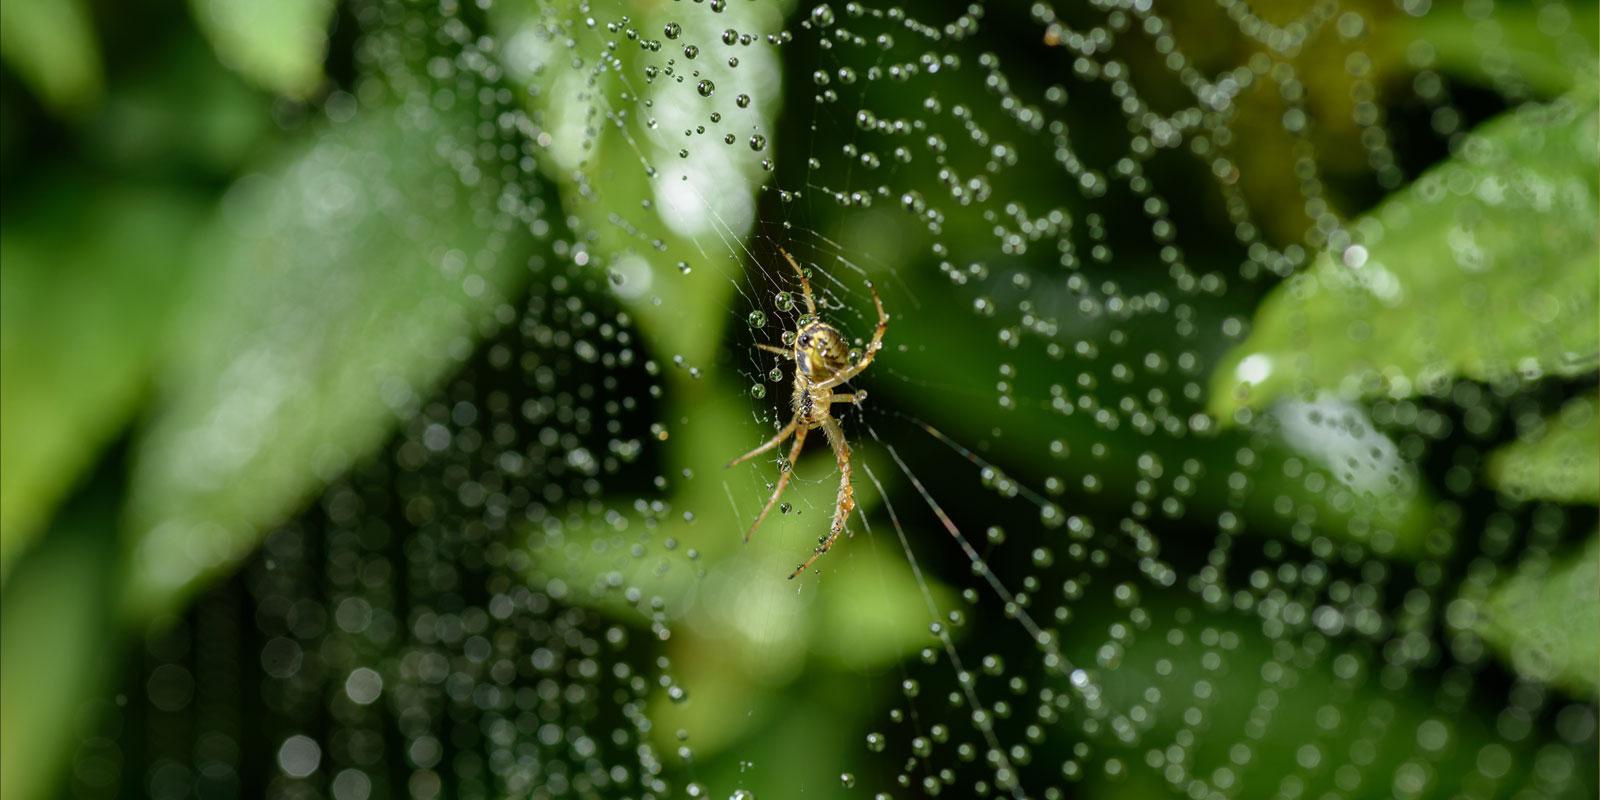 The Spider Blog